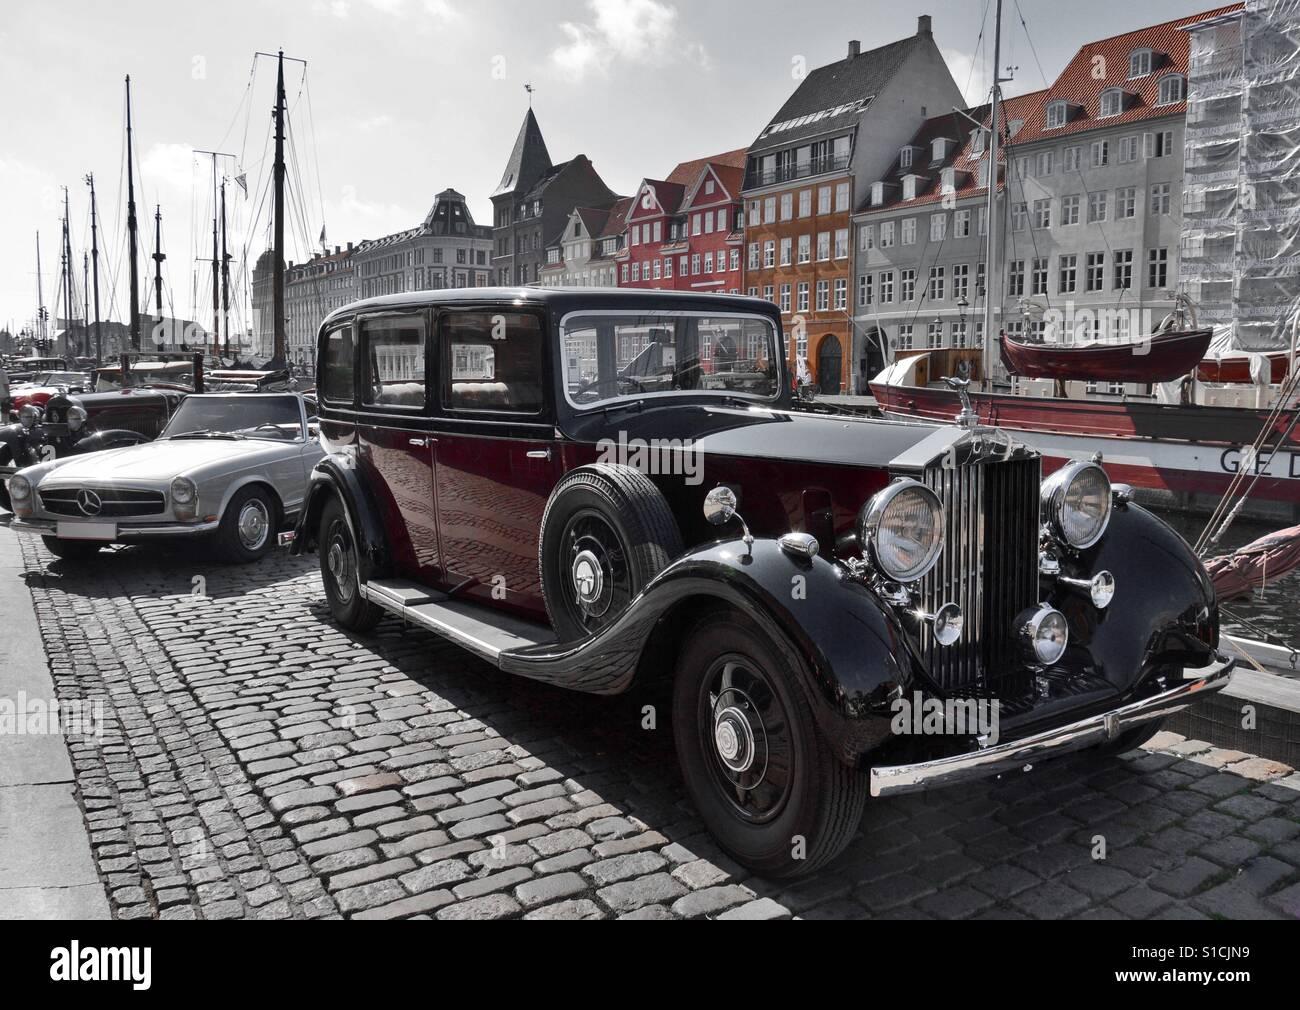 Vintage car at Nyhavn, old waterfront settlement of Copenhagen, Denmark - Stock Image